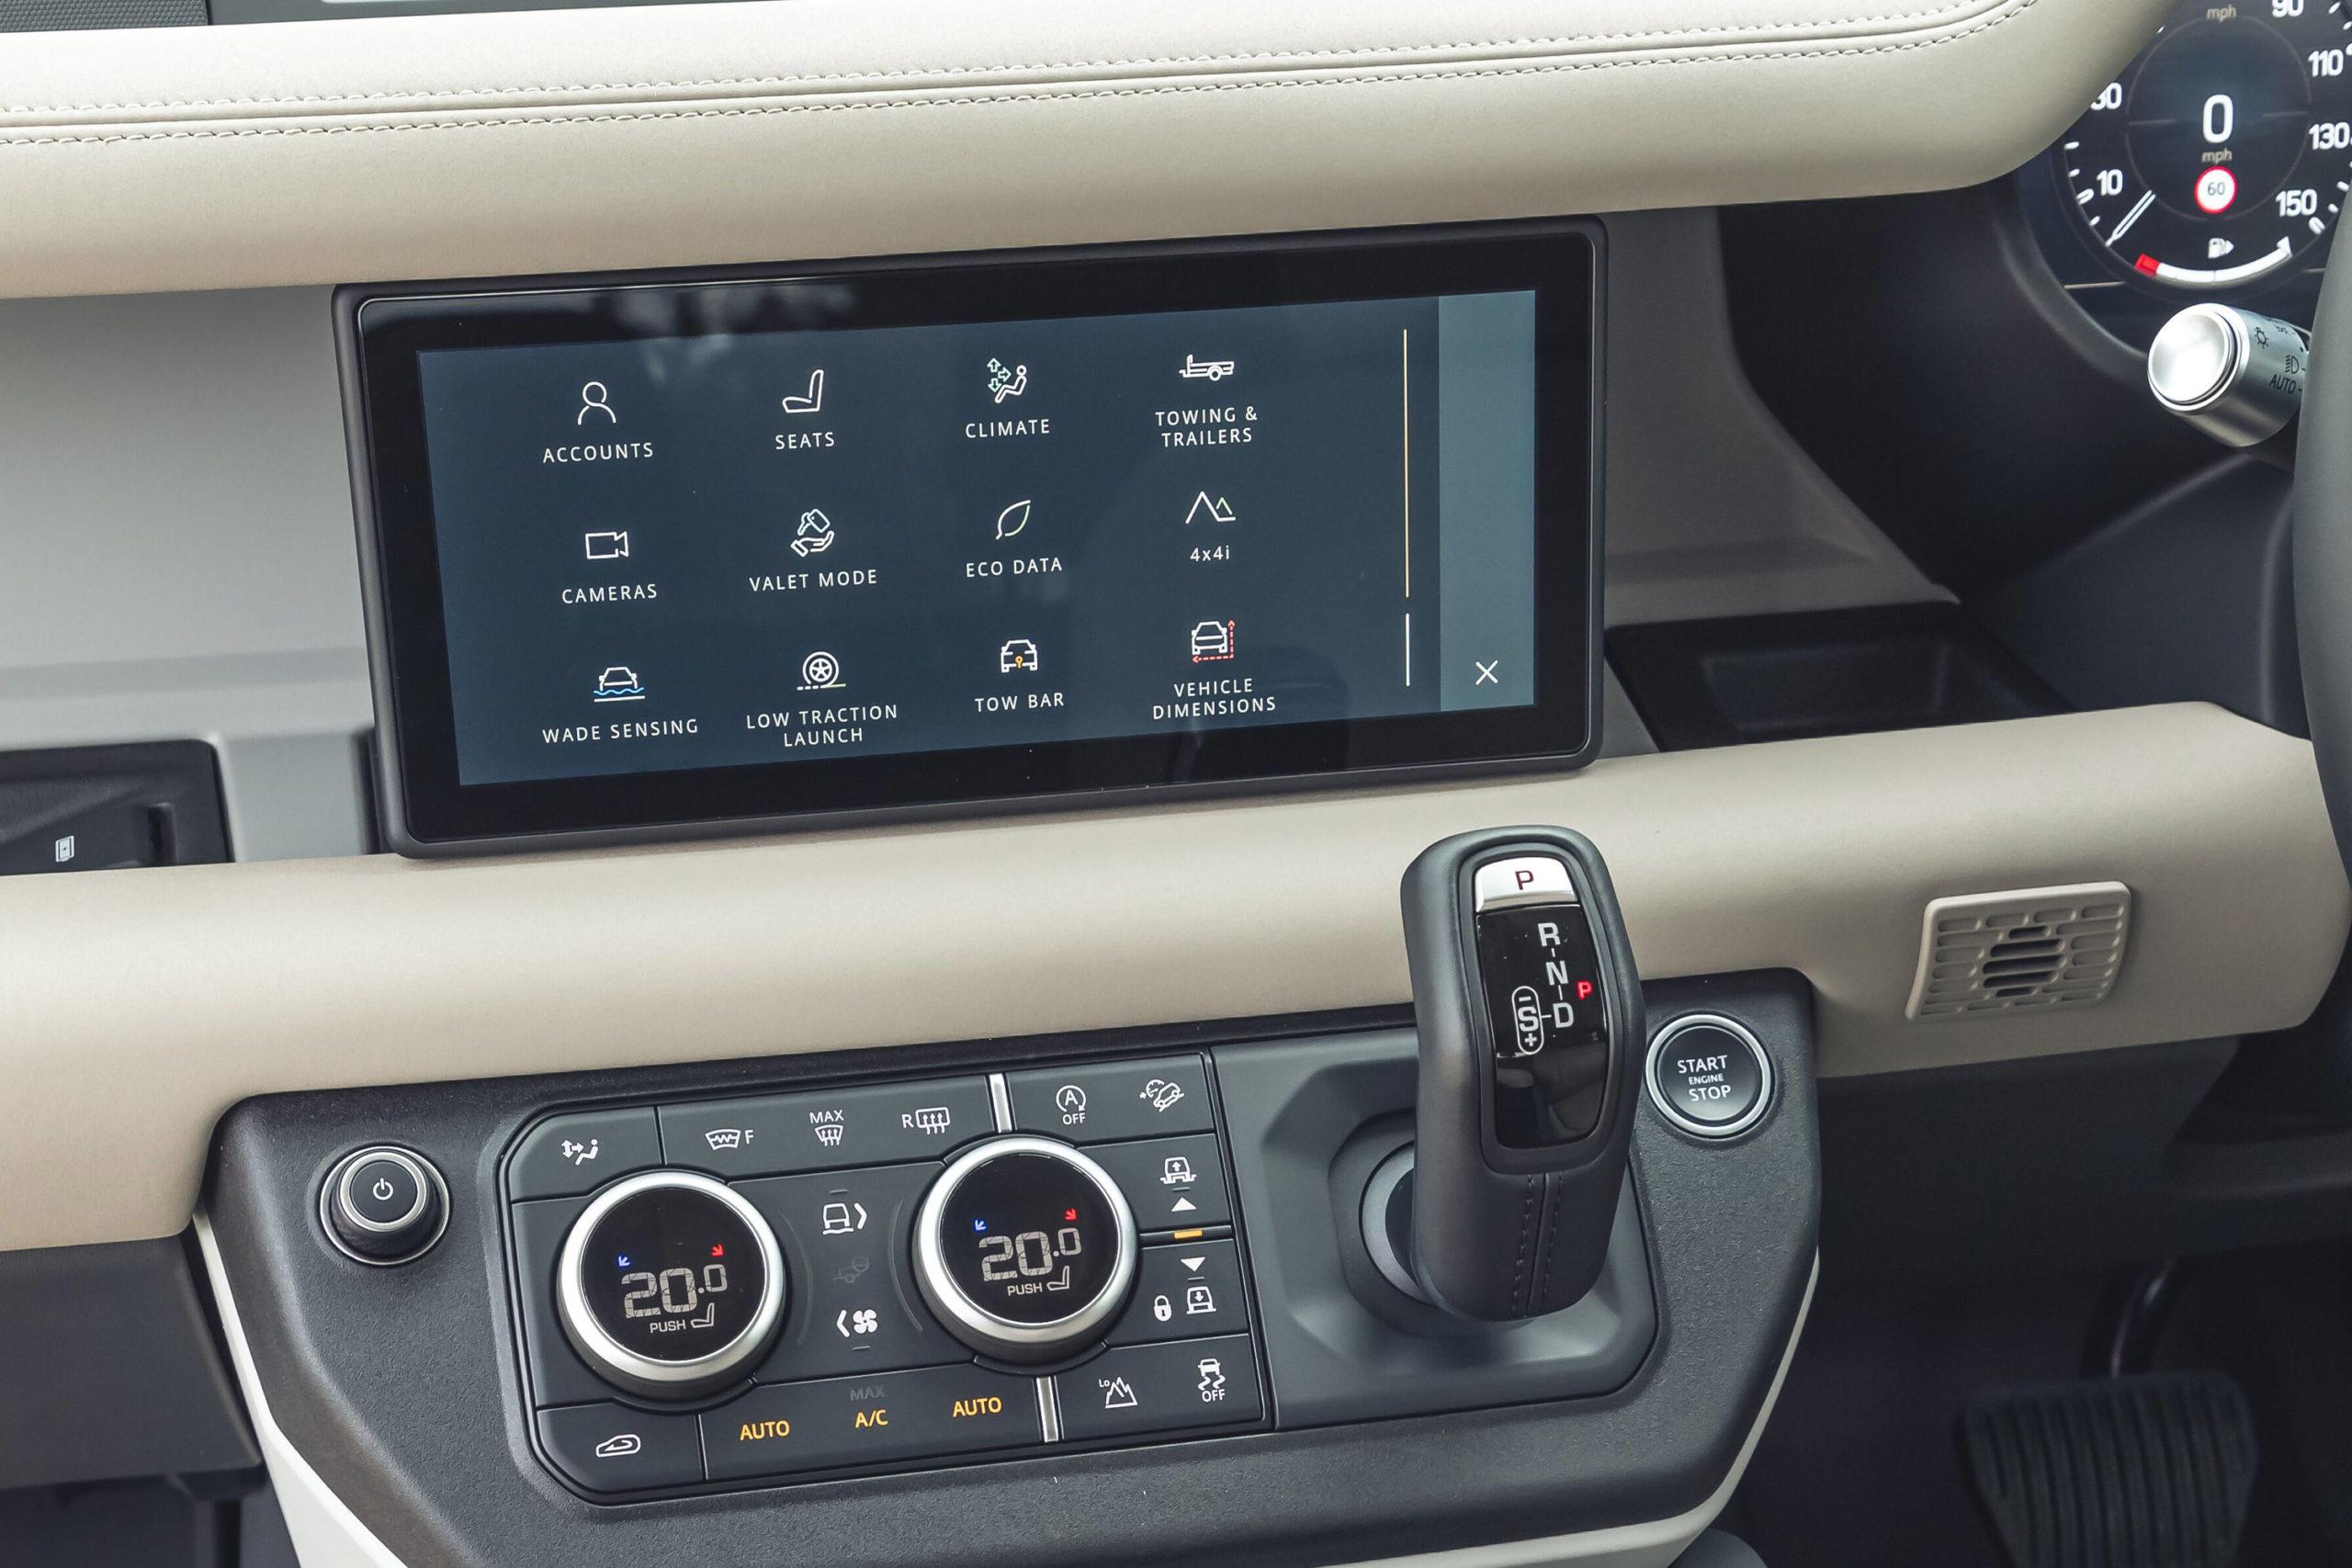 2020-Land-Rover-Defender-infotainment